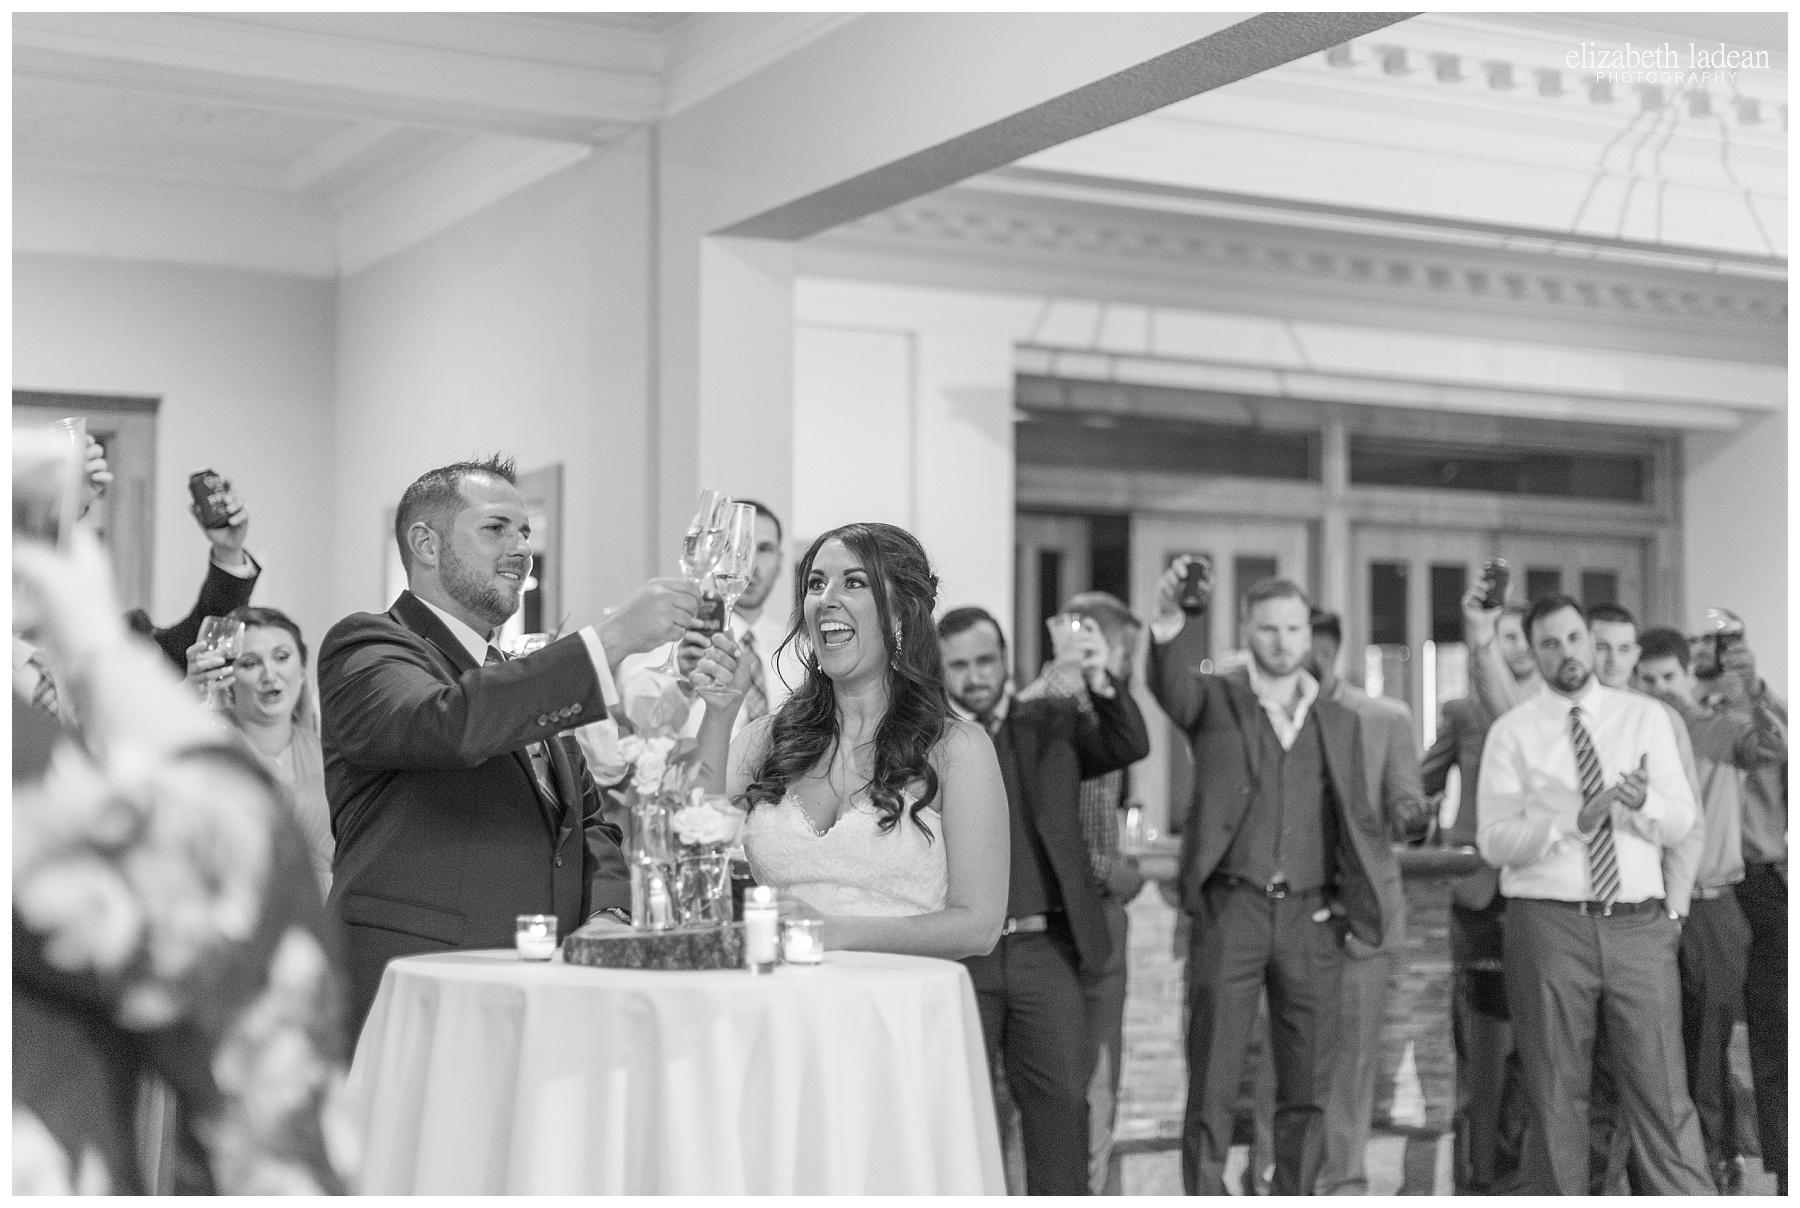 Hillcrest-Country-Club-Kansas-City-Wedding-Photography-E+J-0520-Elizabeth-Ladean-Photography-photo_0879.jpg